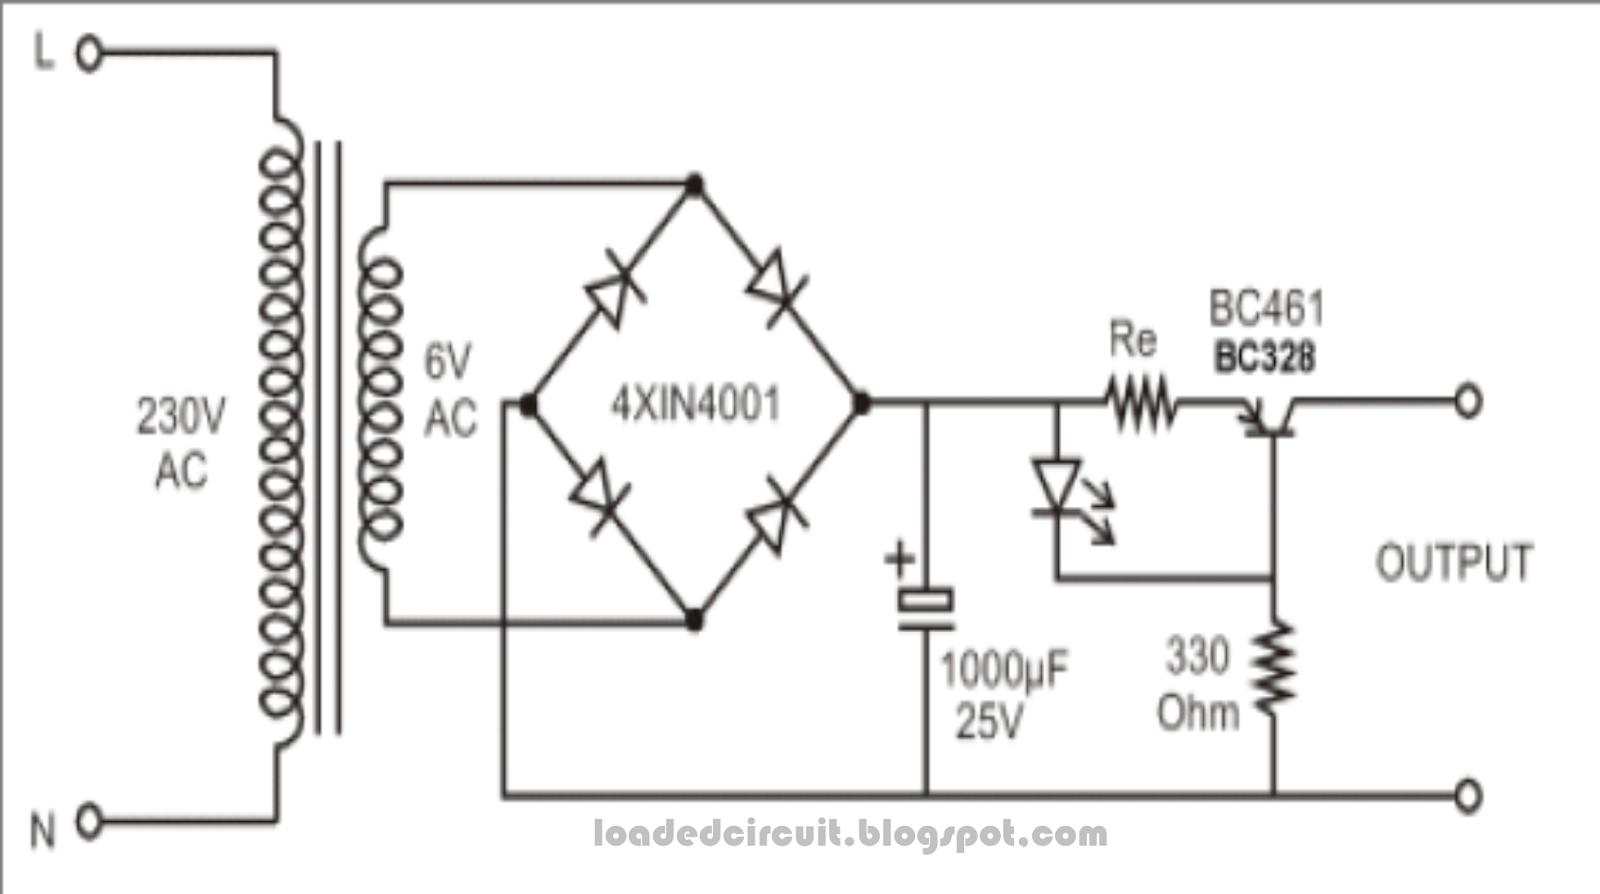 voltagecontrolled current source circuit diagram